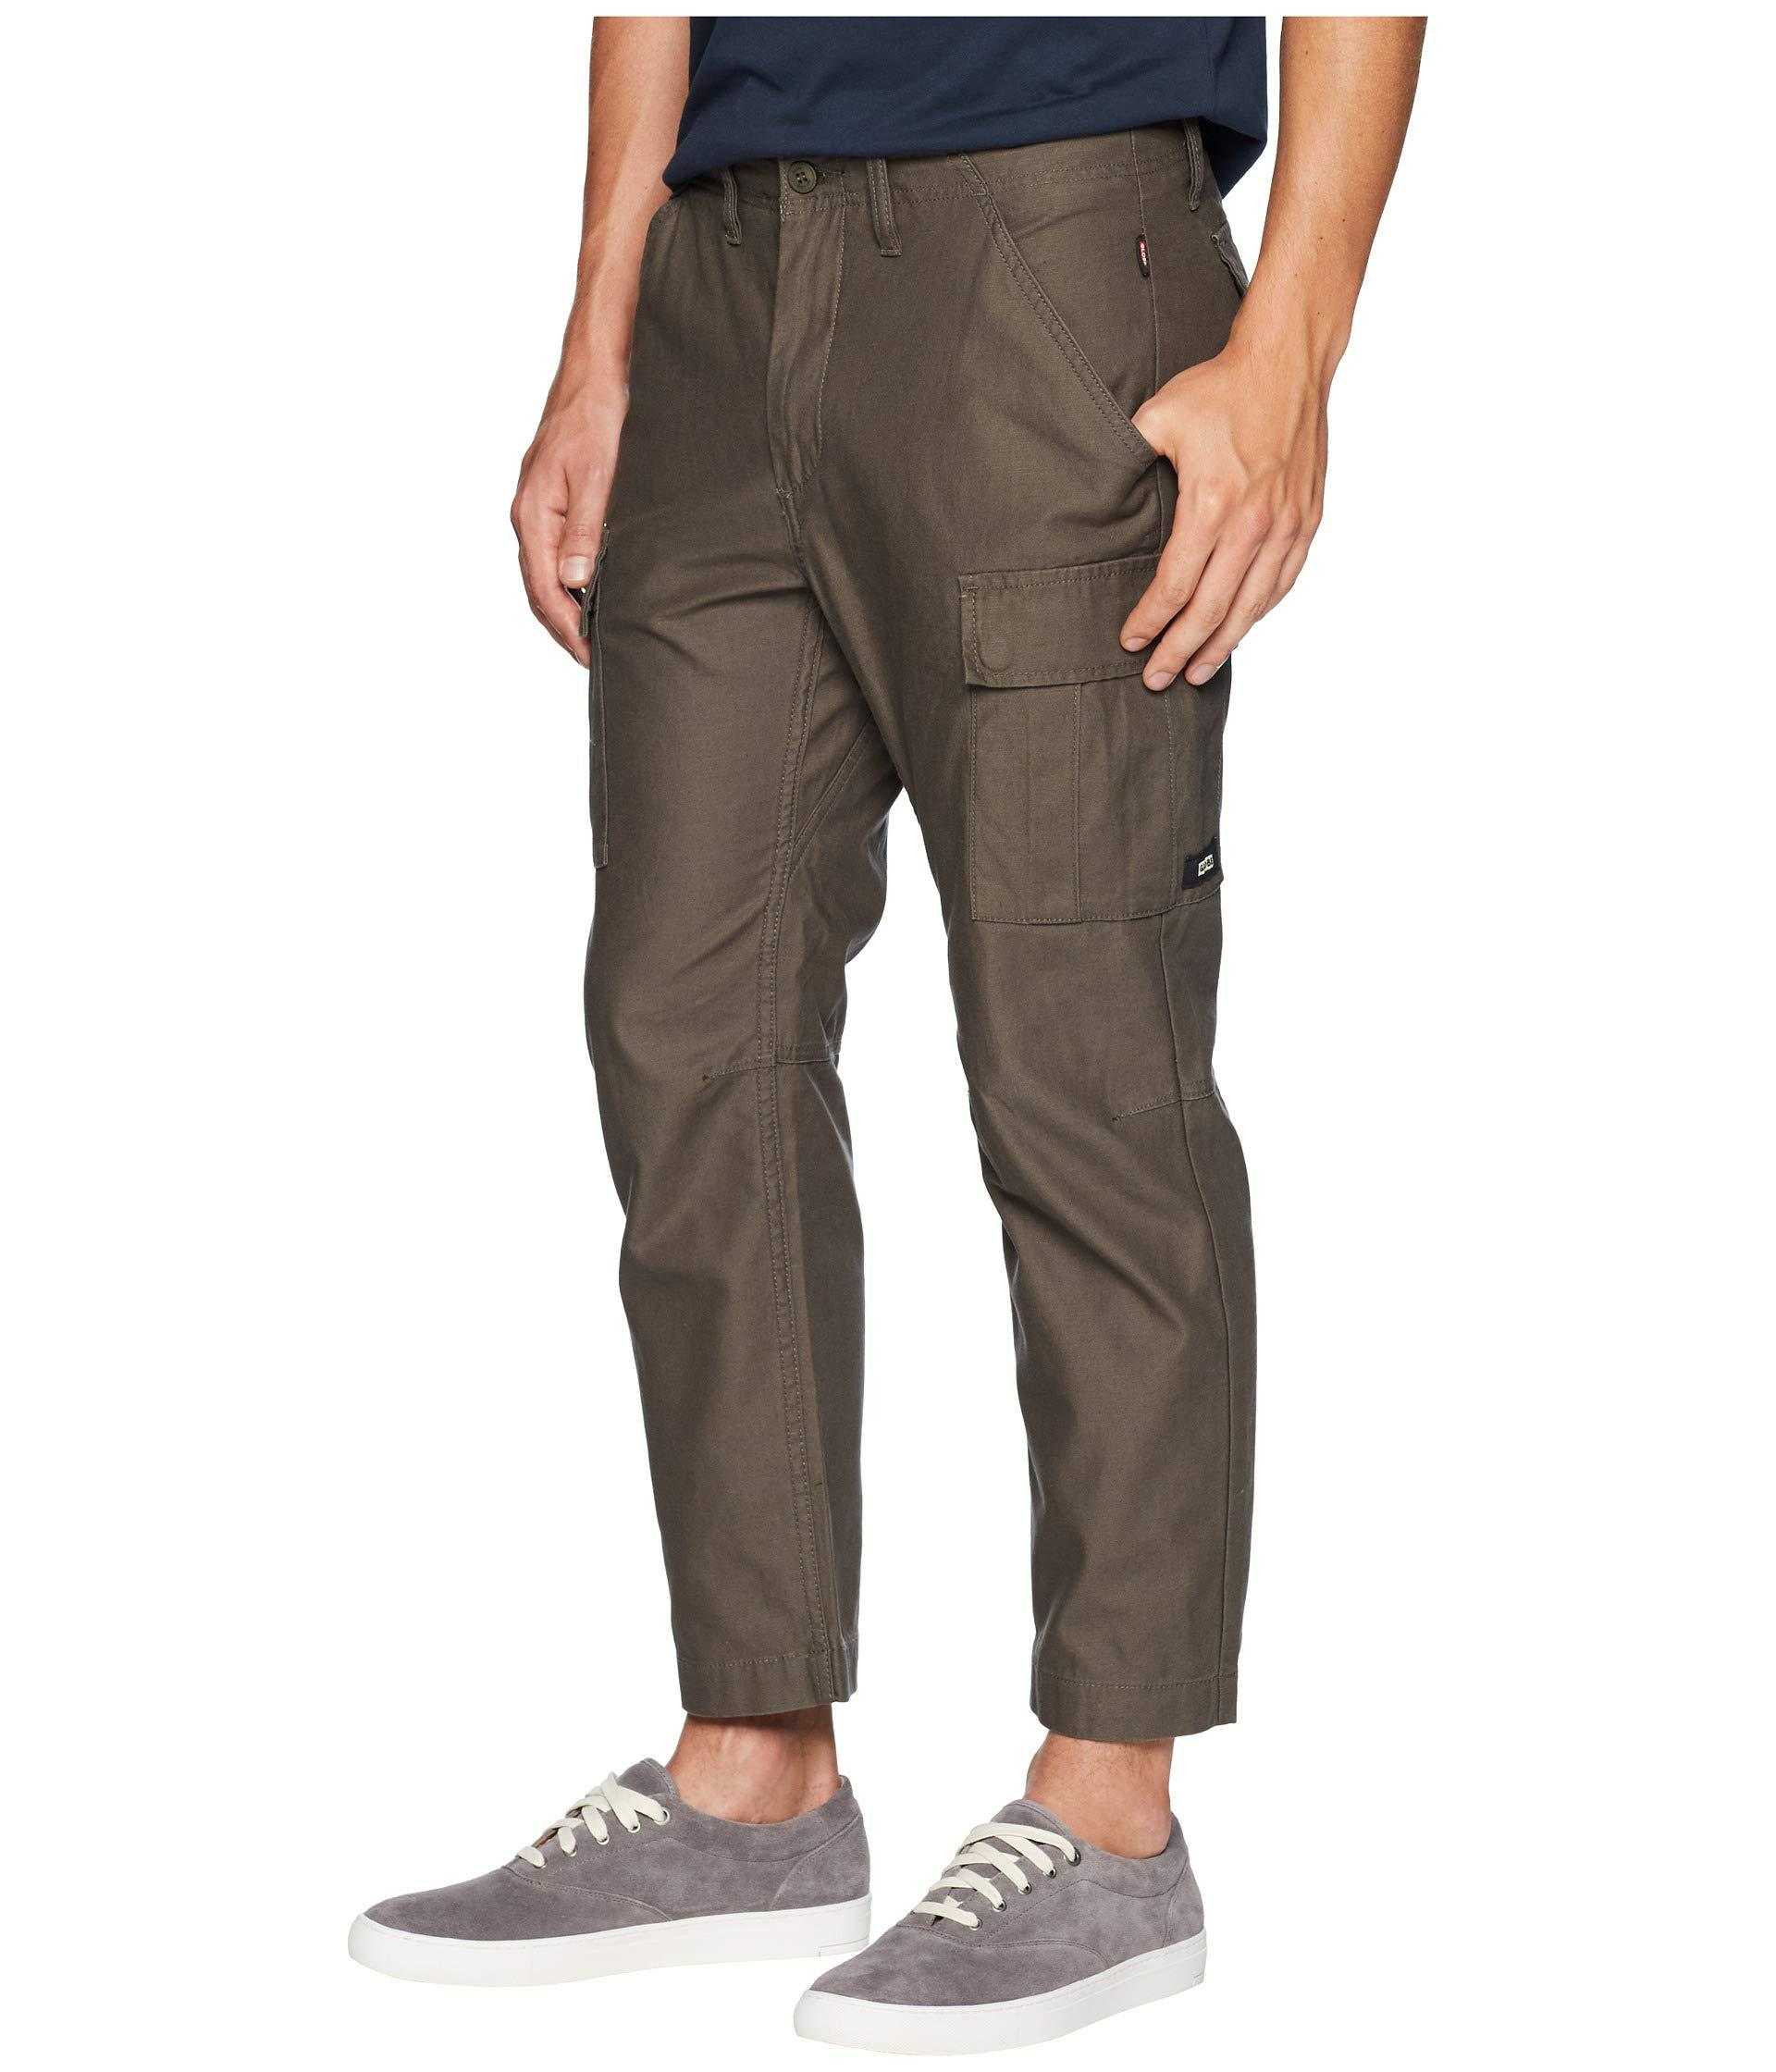 e2d6b0d3dd Lyst - Globe G5 Militant Cargo Pants for Men